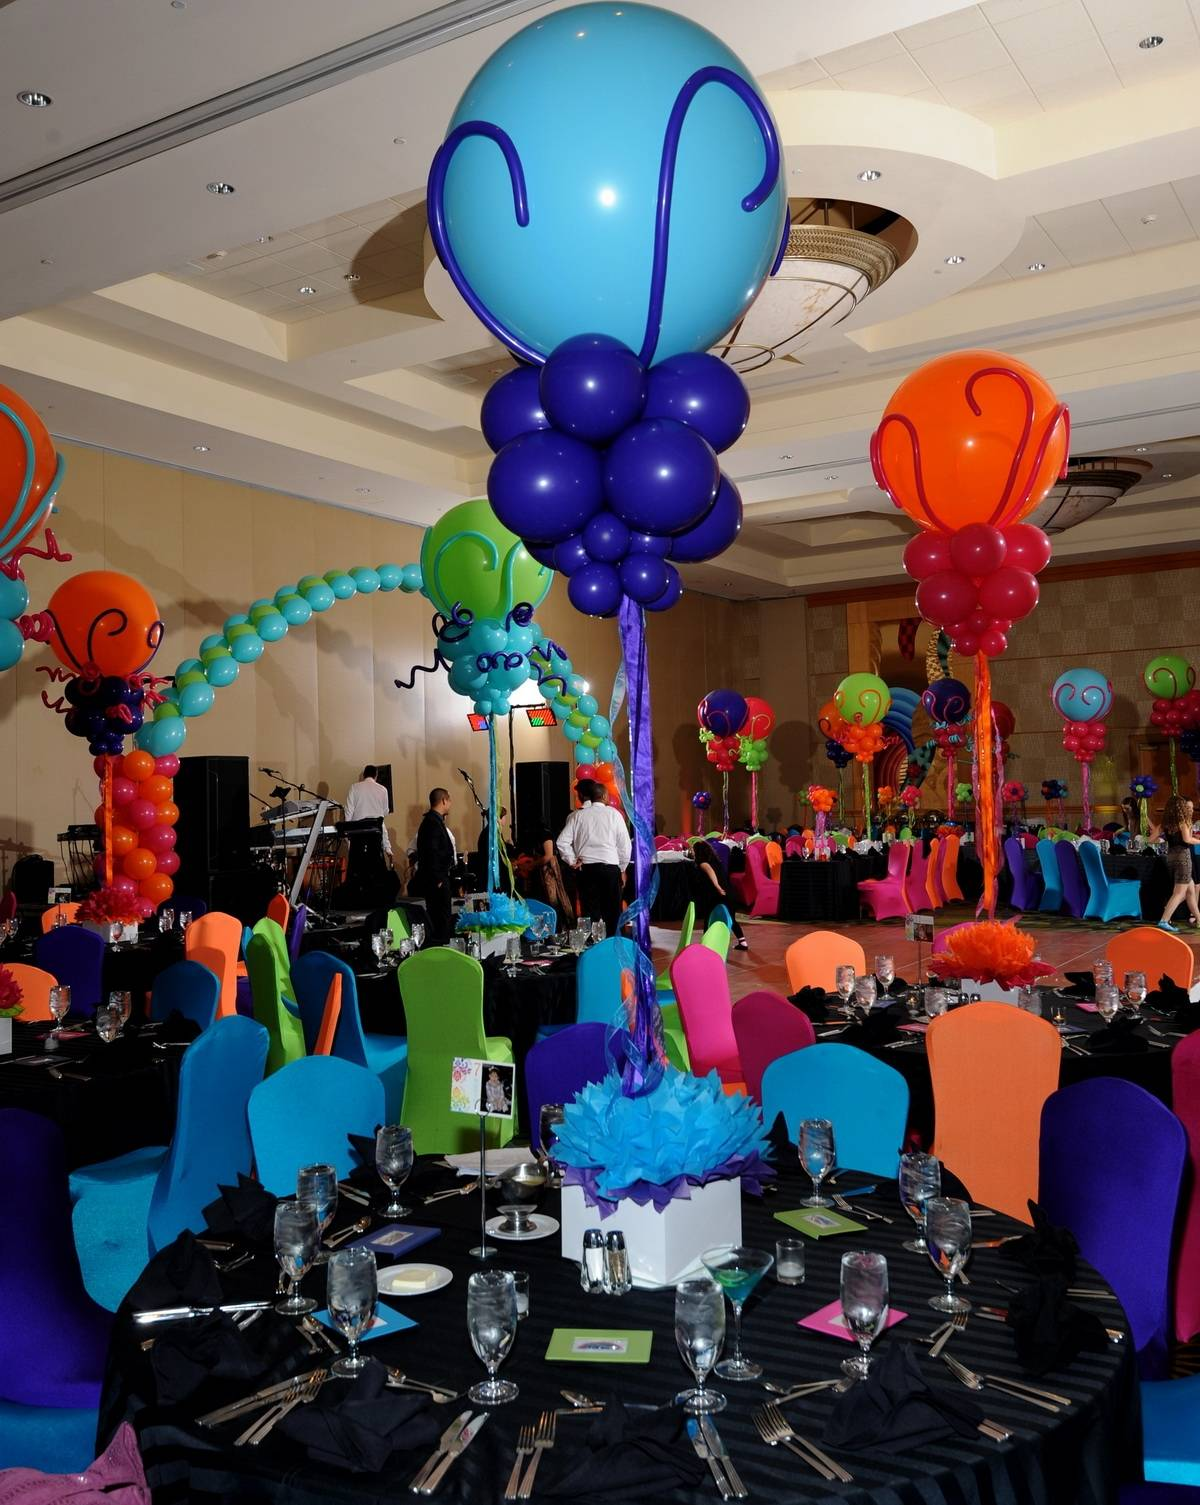 Balloon Centerpieces at Bat Mitzvah